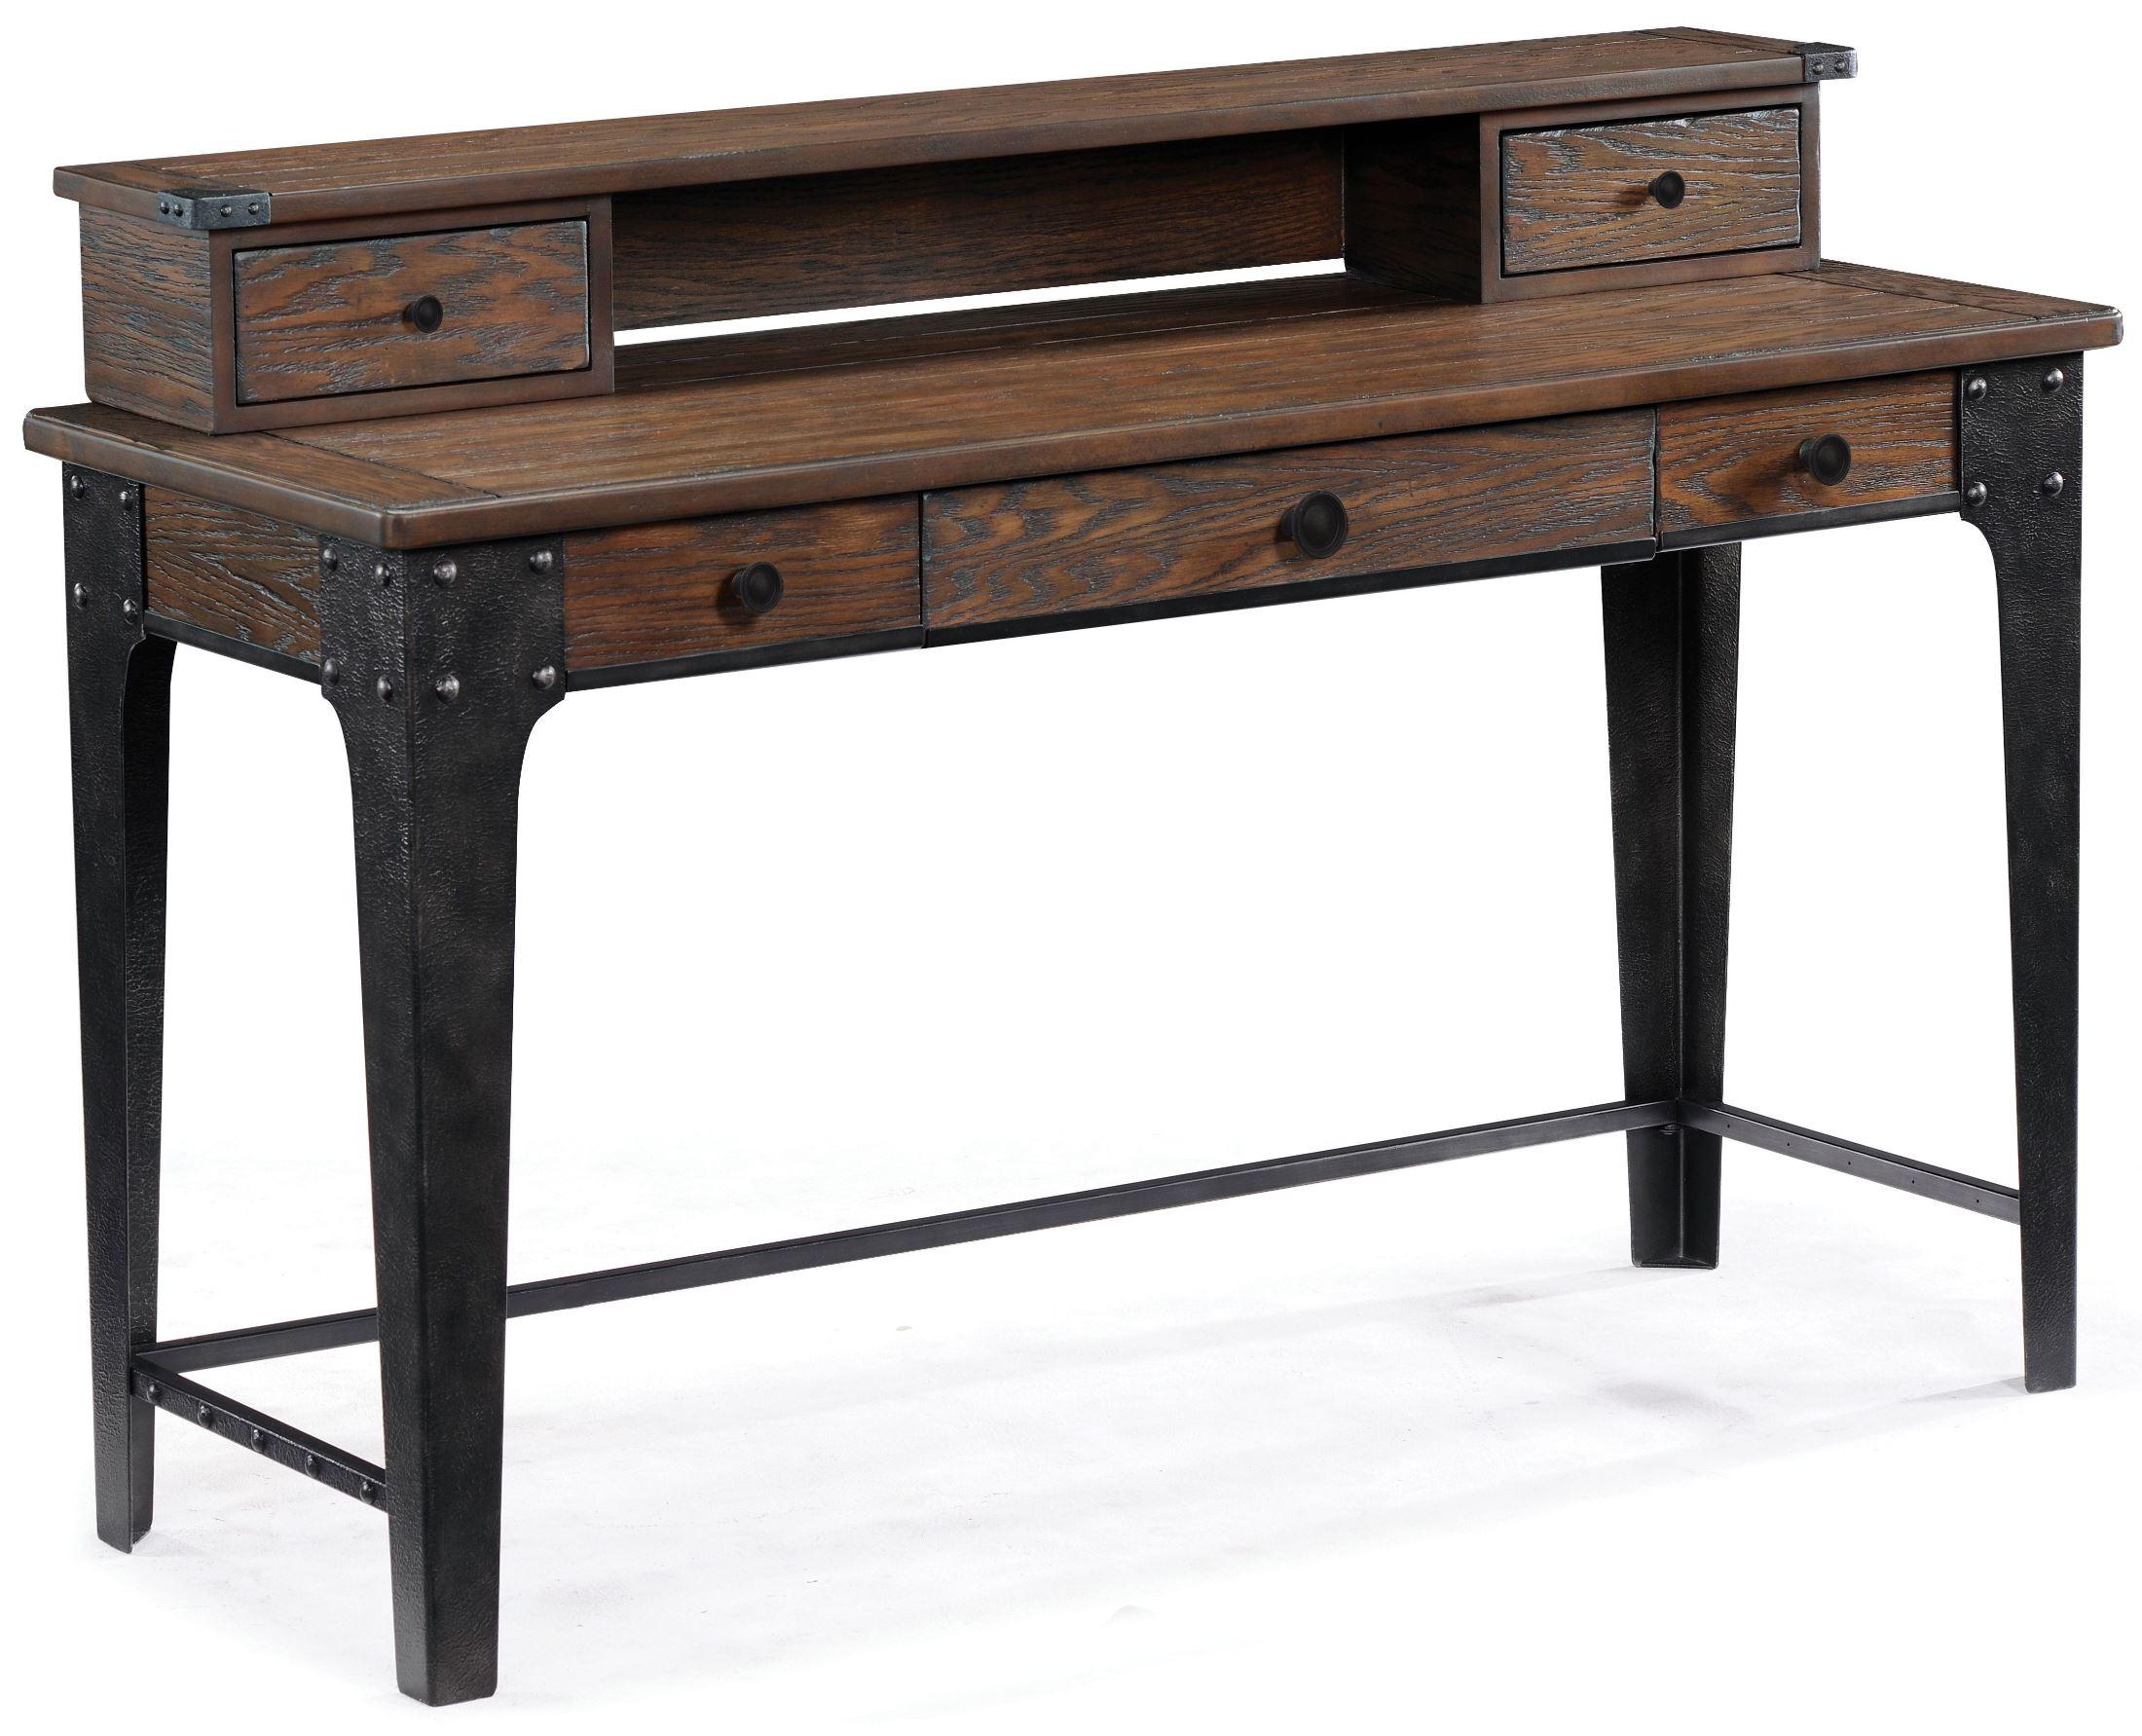 magnussen lakehurst sofa table desk   lakehurst collection